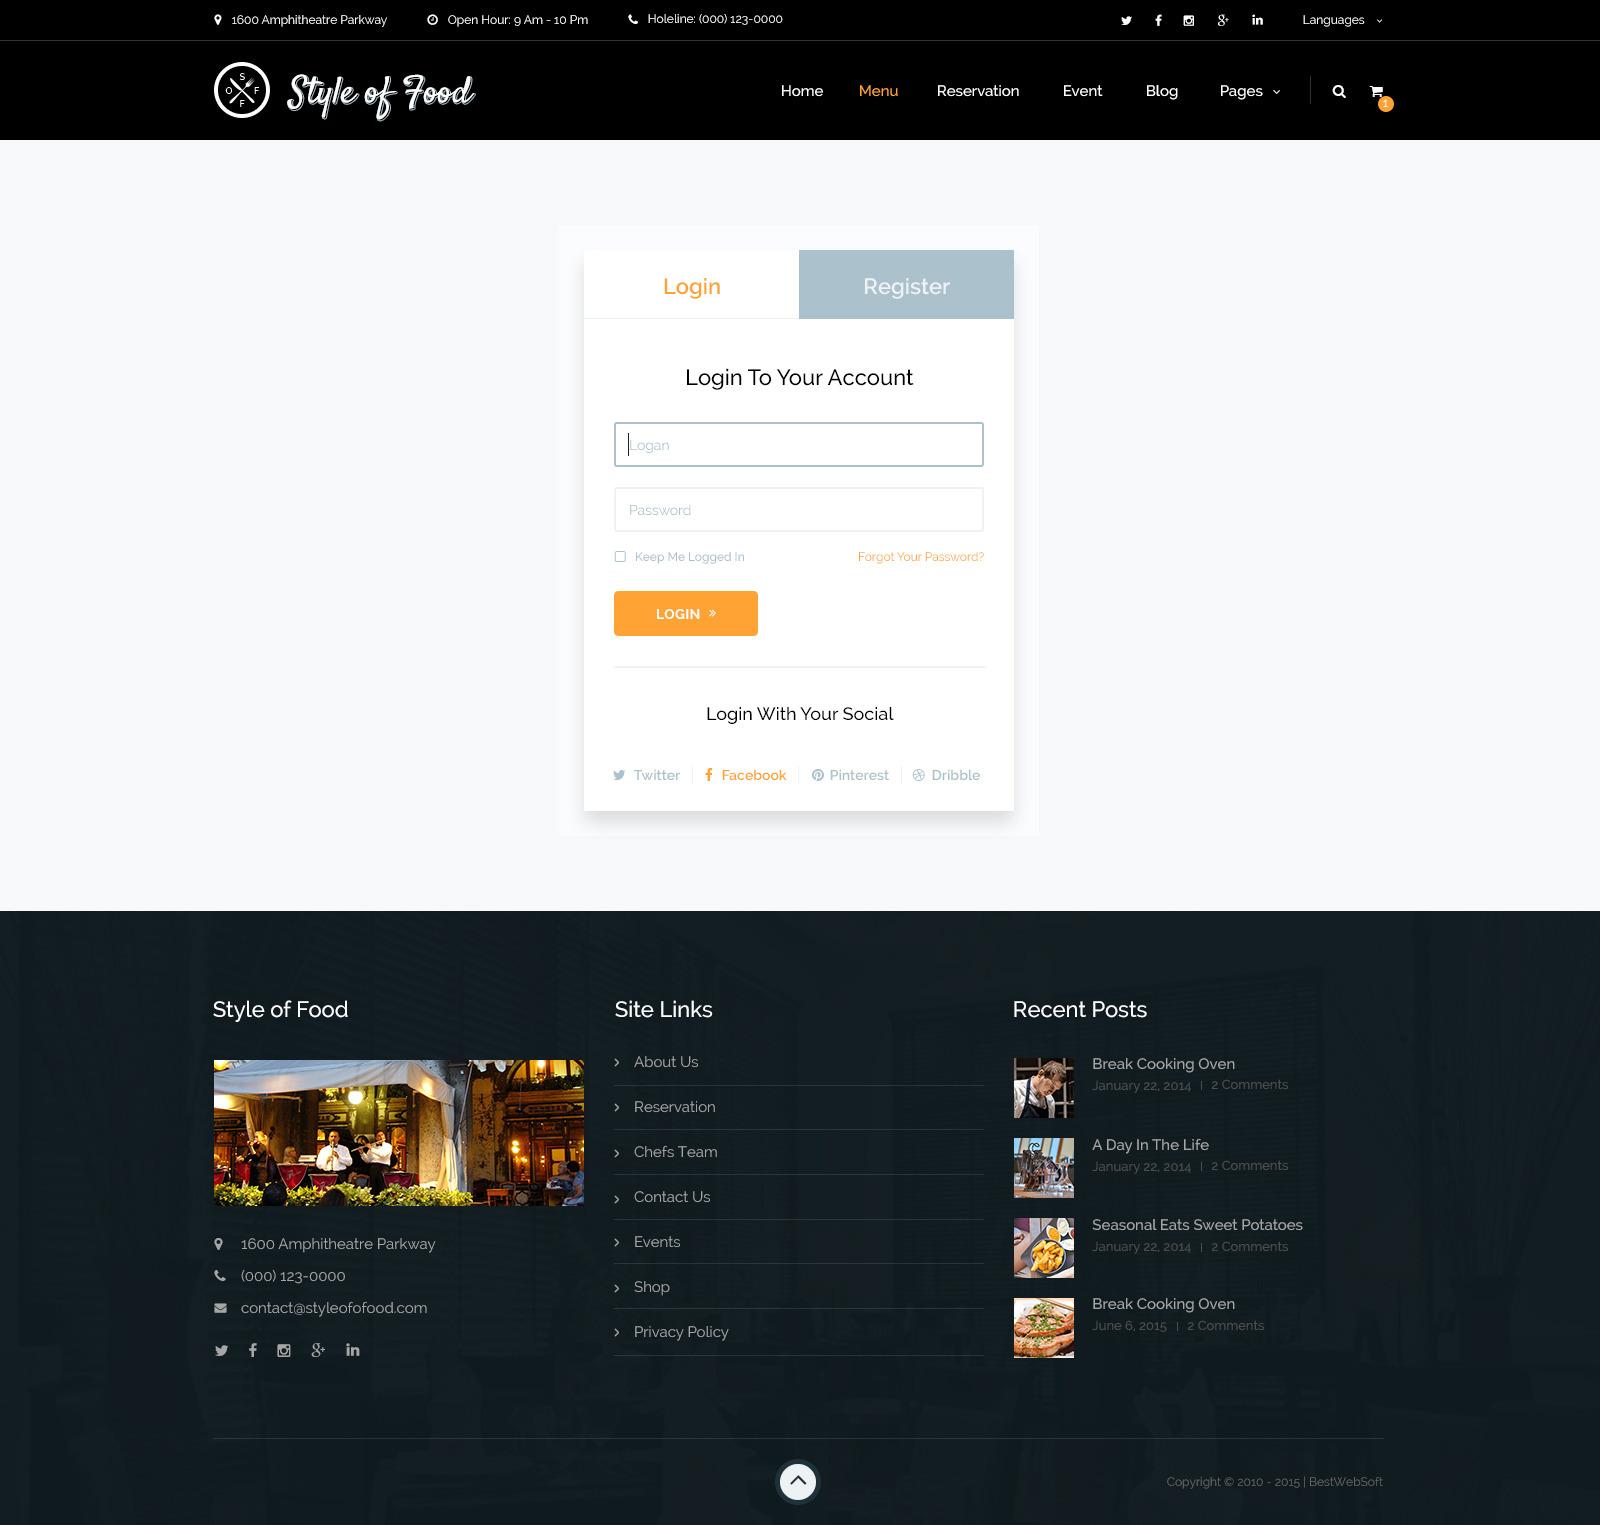 Restaurant.com Account Login